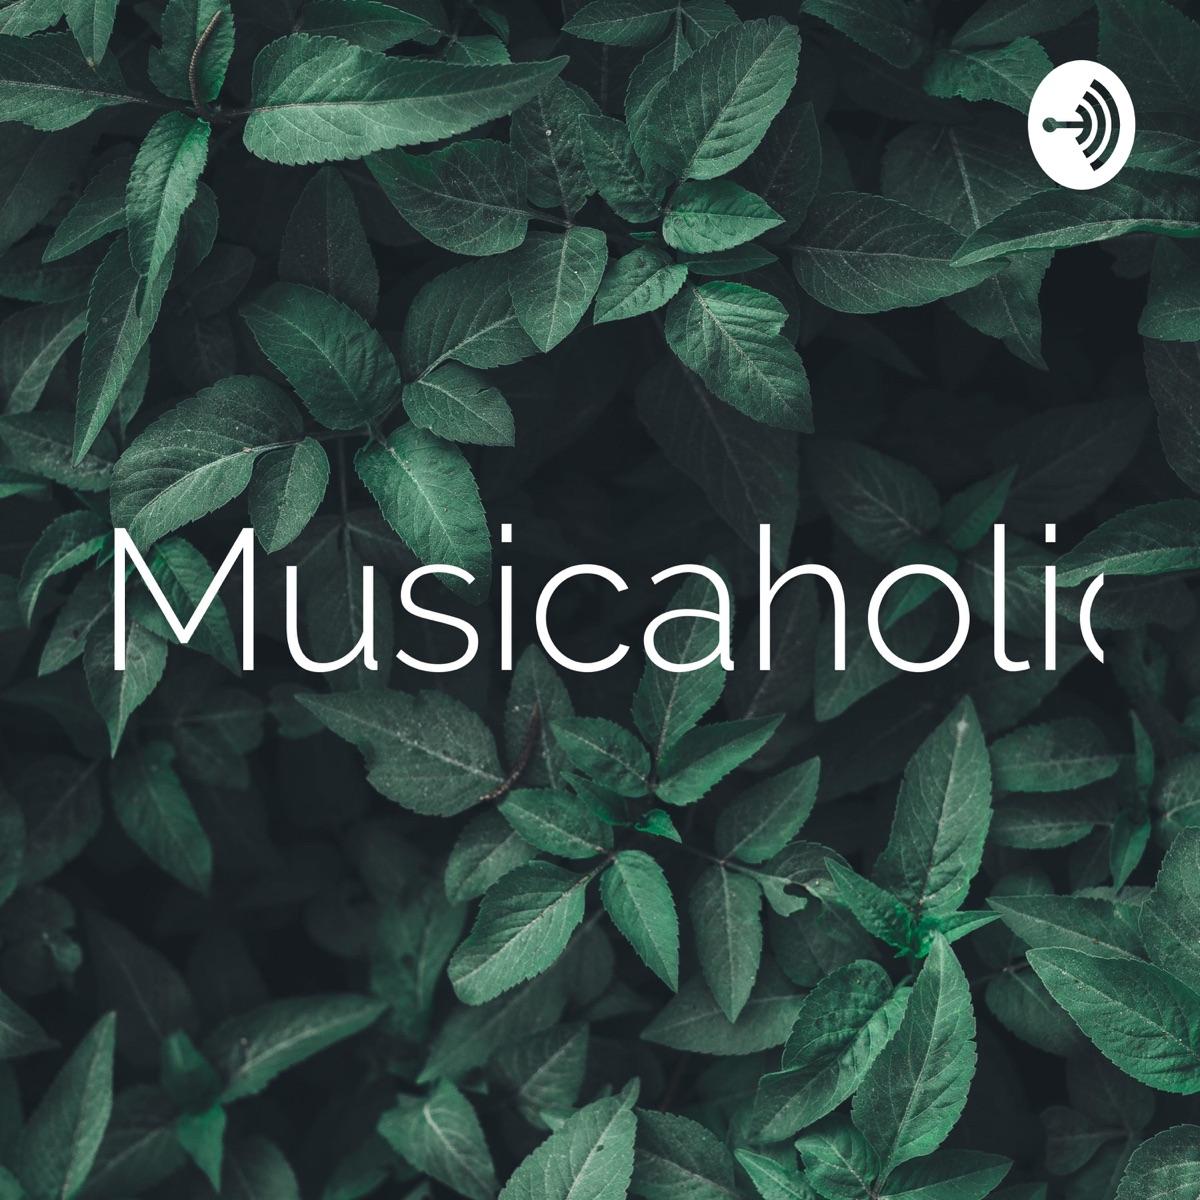 Musicaholics